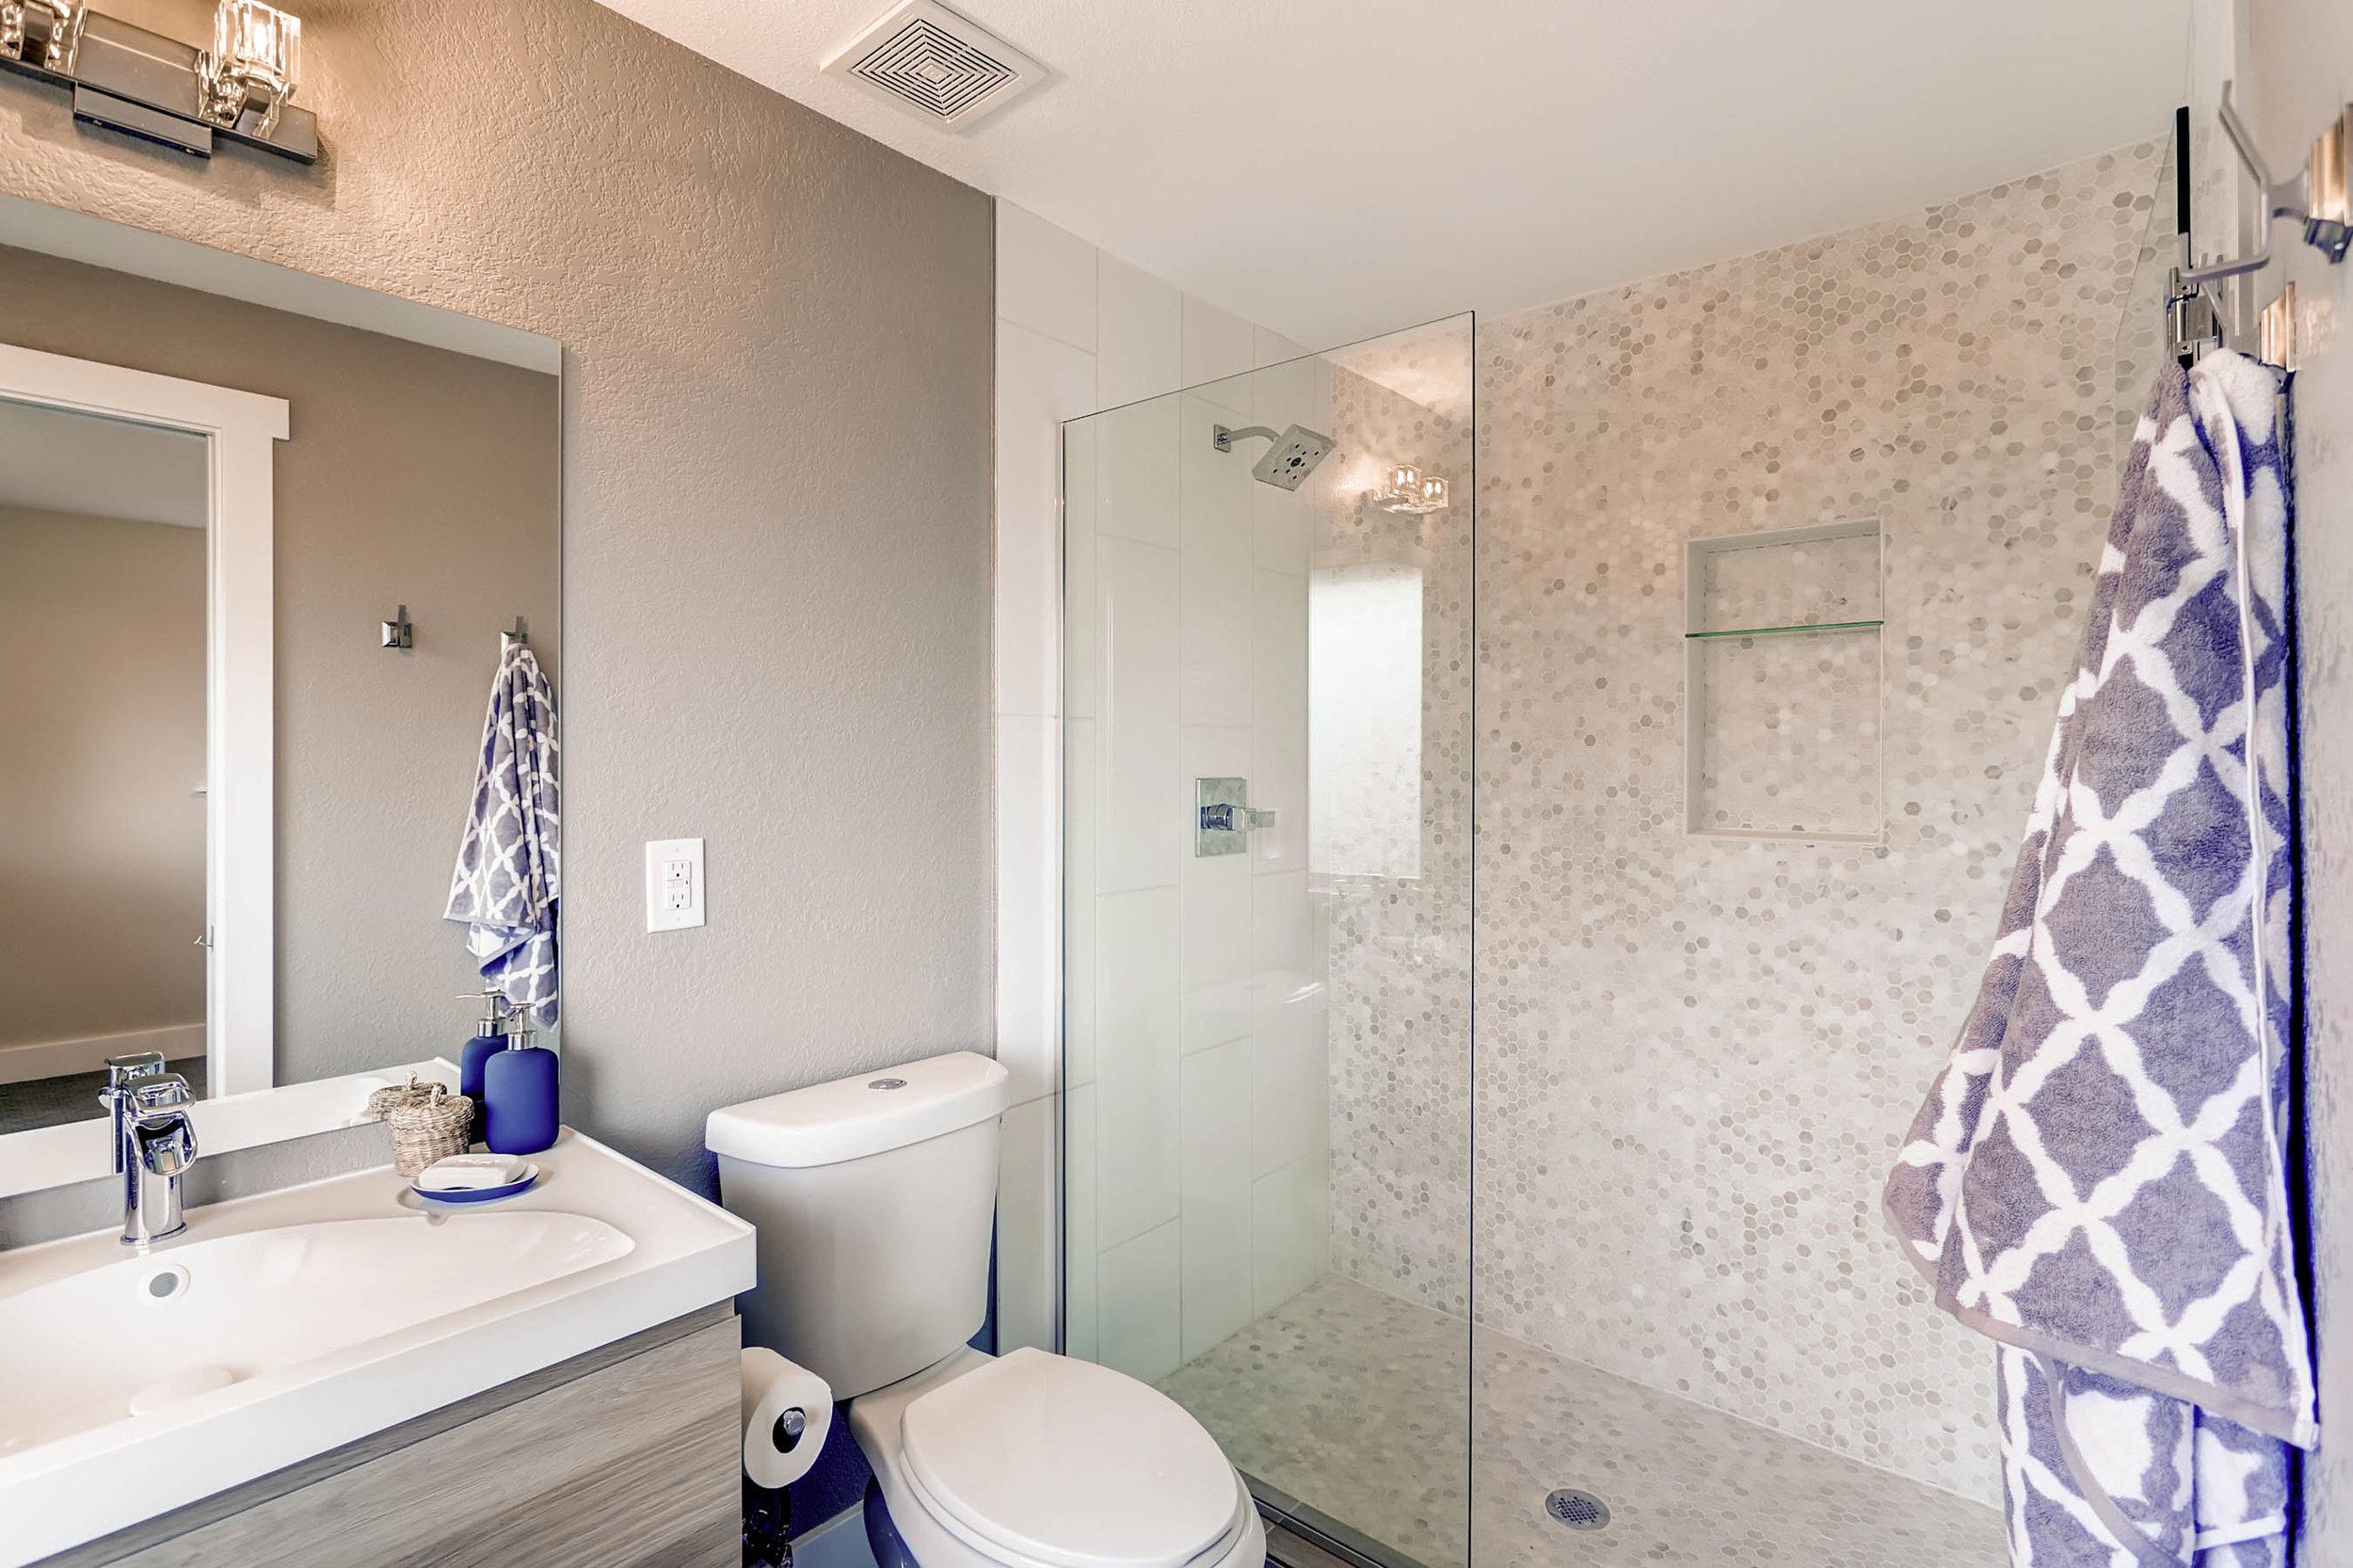 486 S Cole Ct Lakewood CO-print-014-13-Master Bathroom-2700x1799-300dpi.jpg